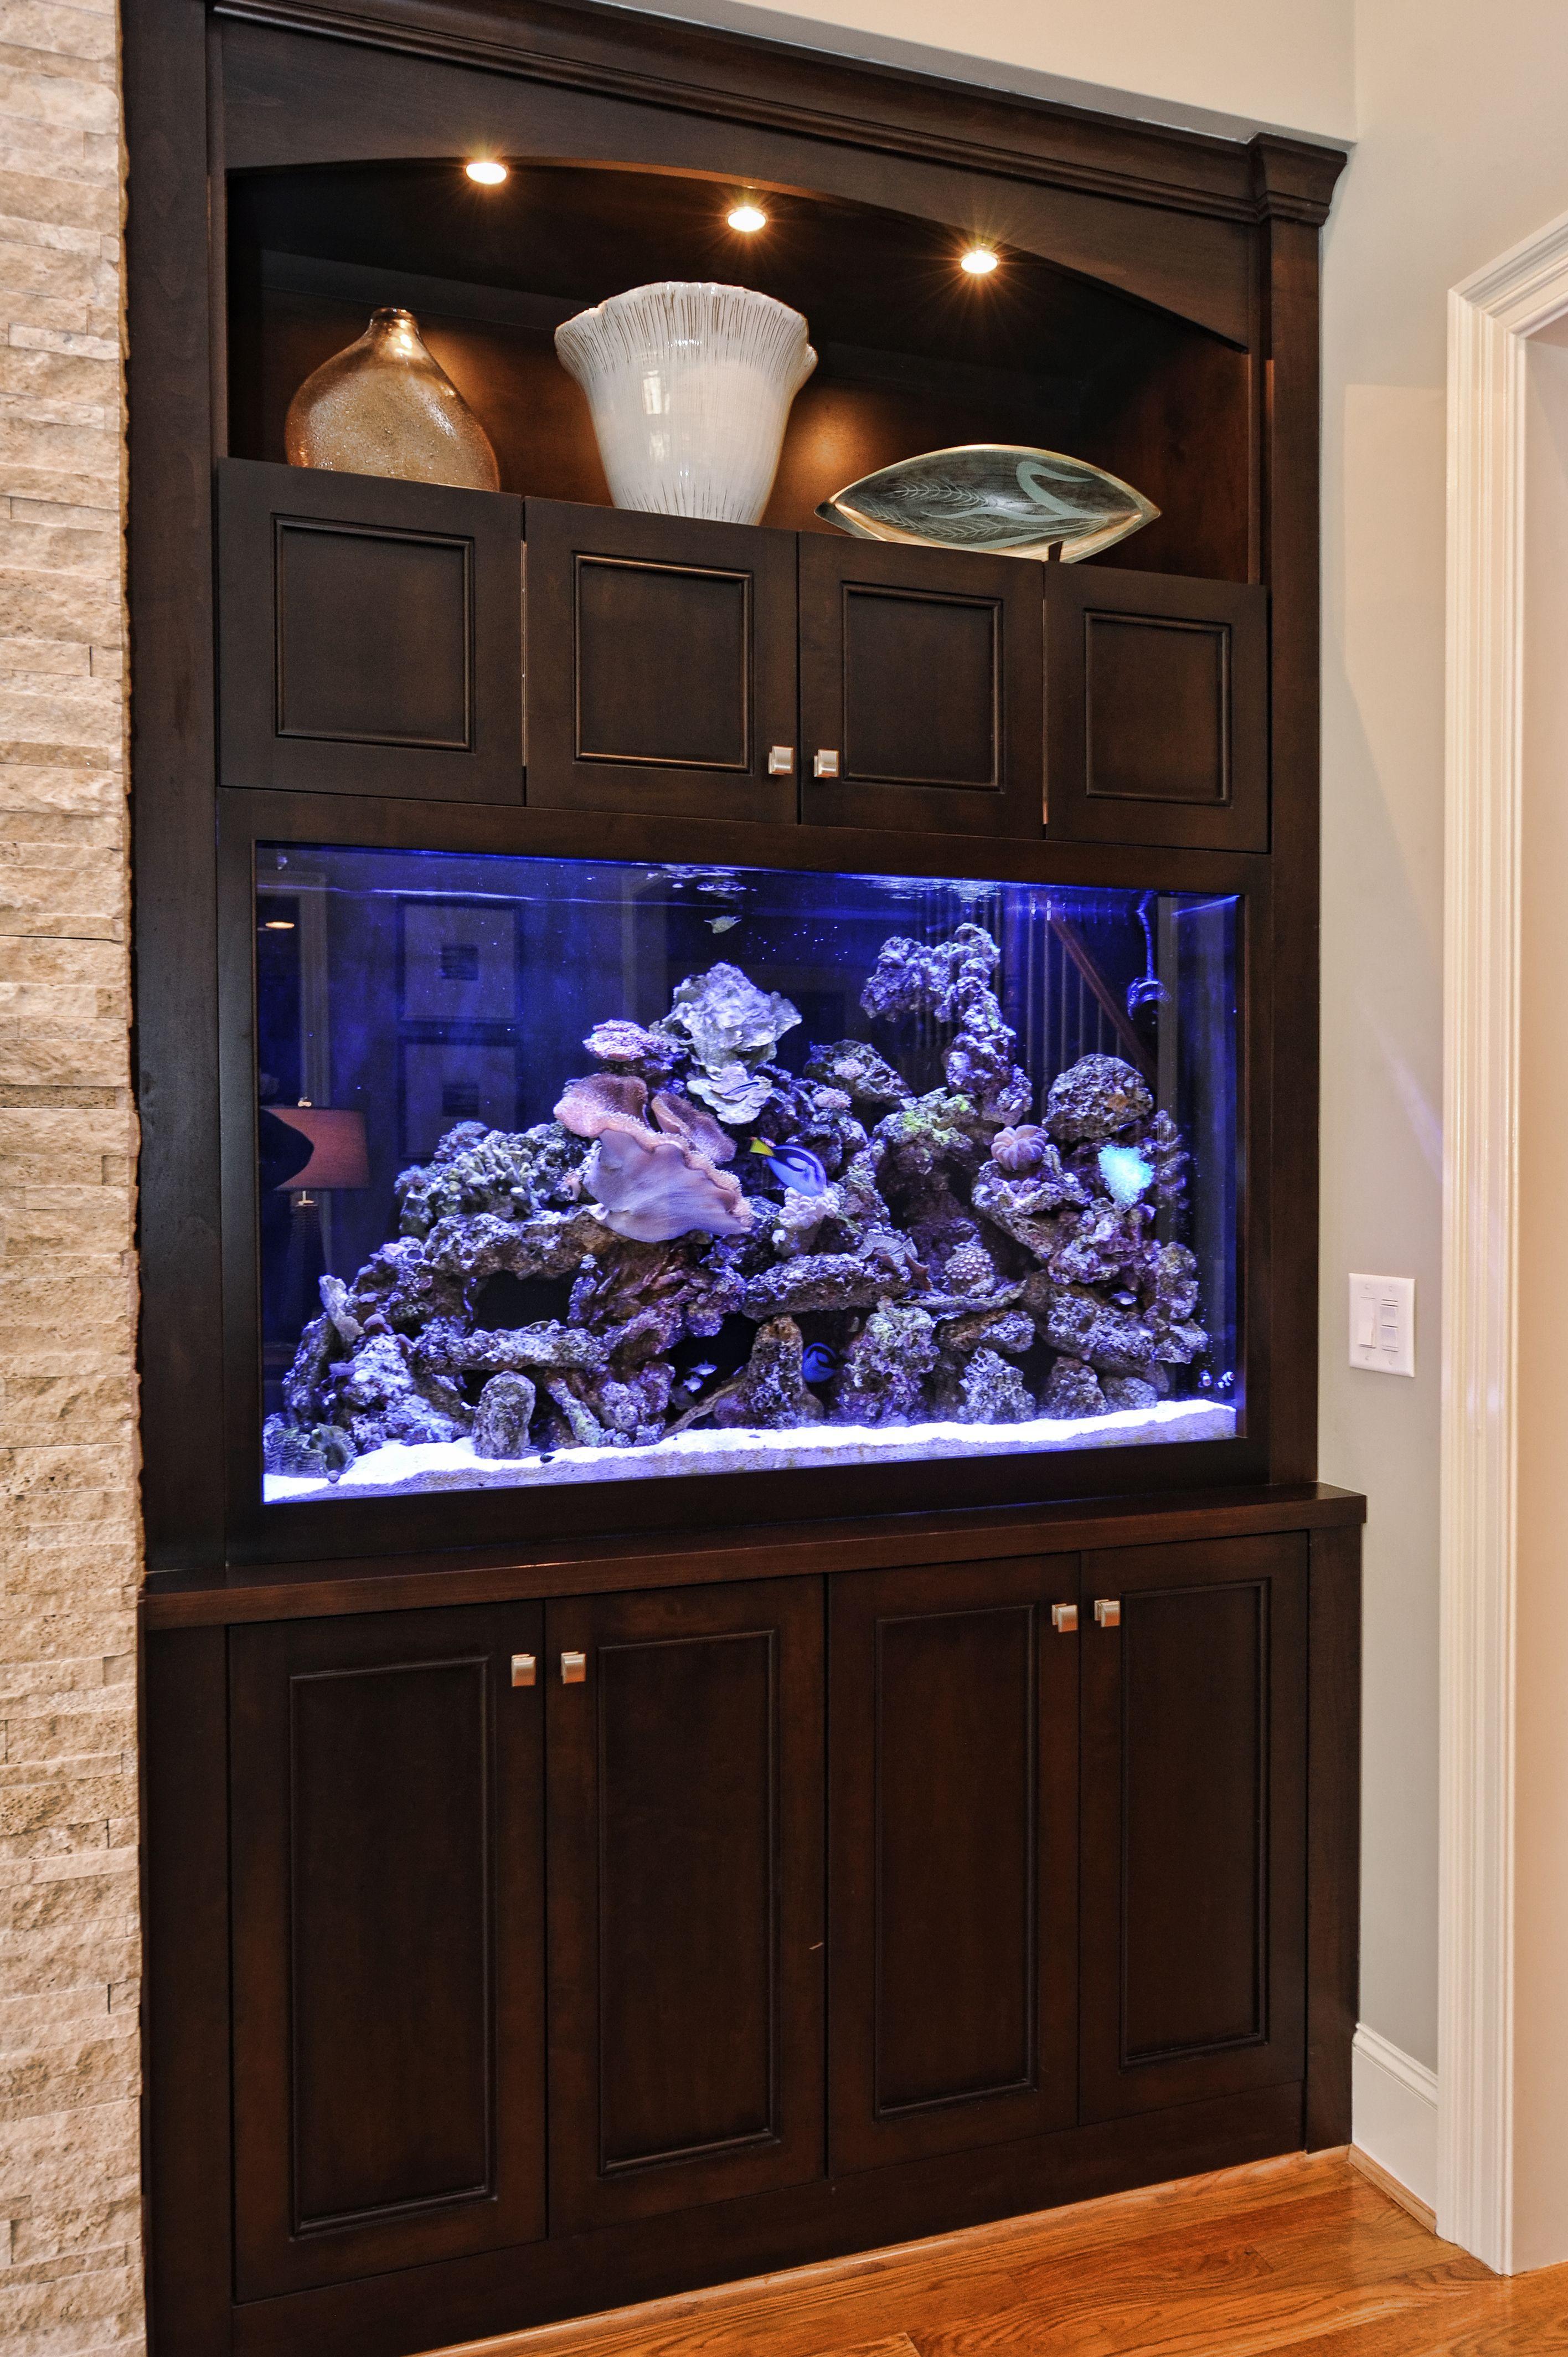 custom fish tank | Family living rooms, Custom fish tanks ...